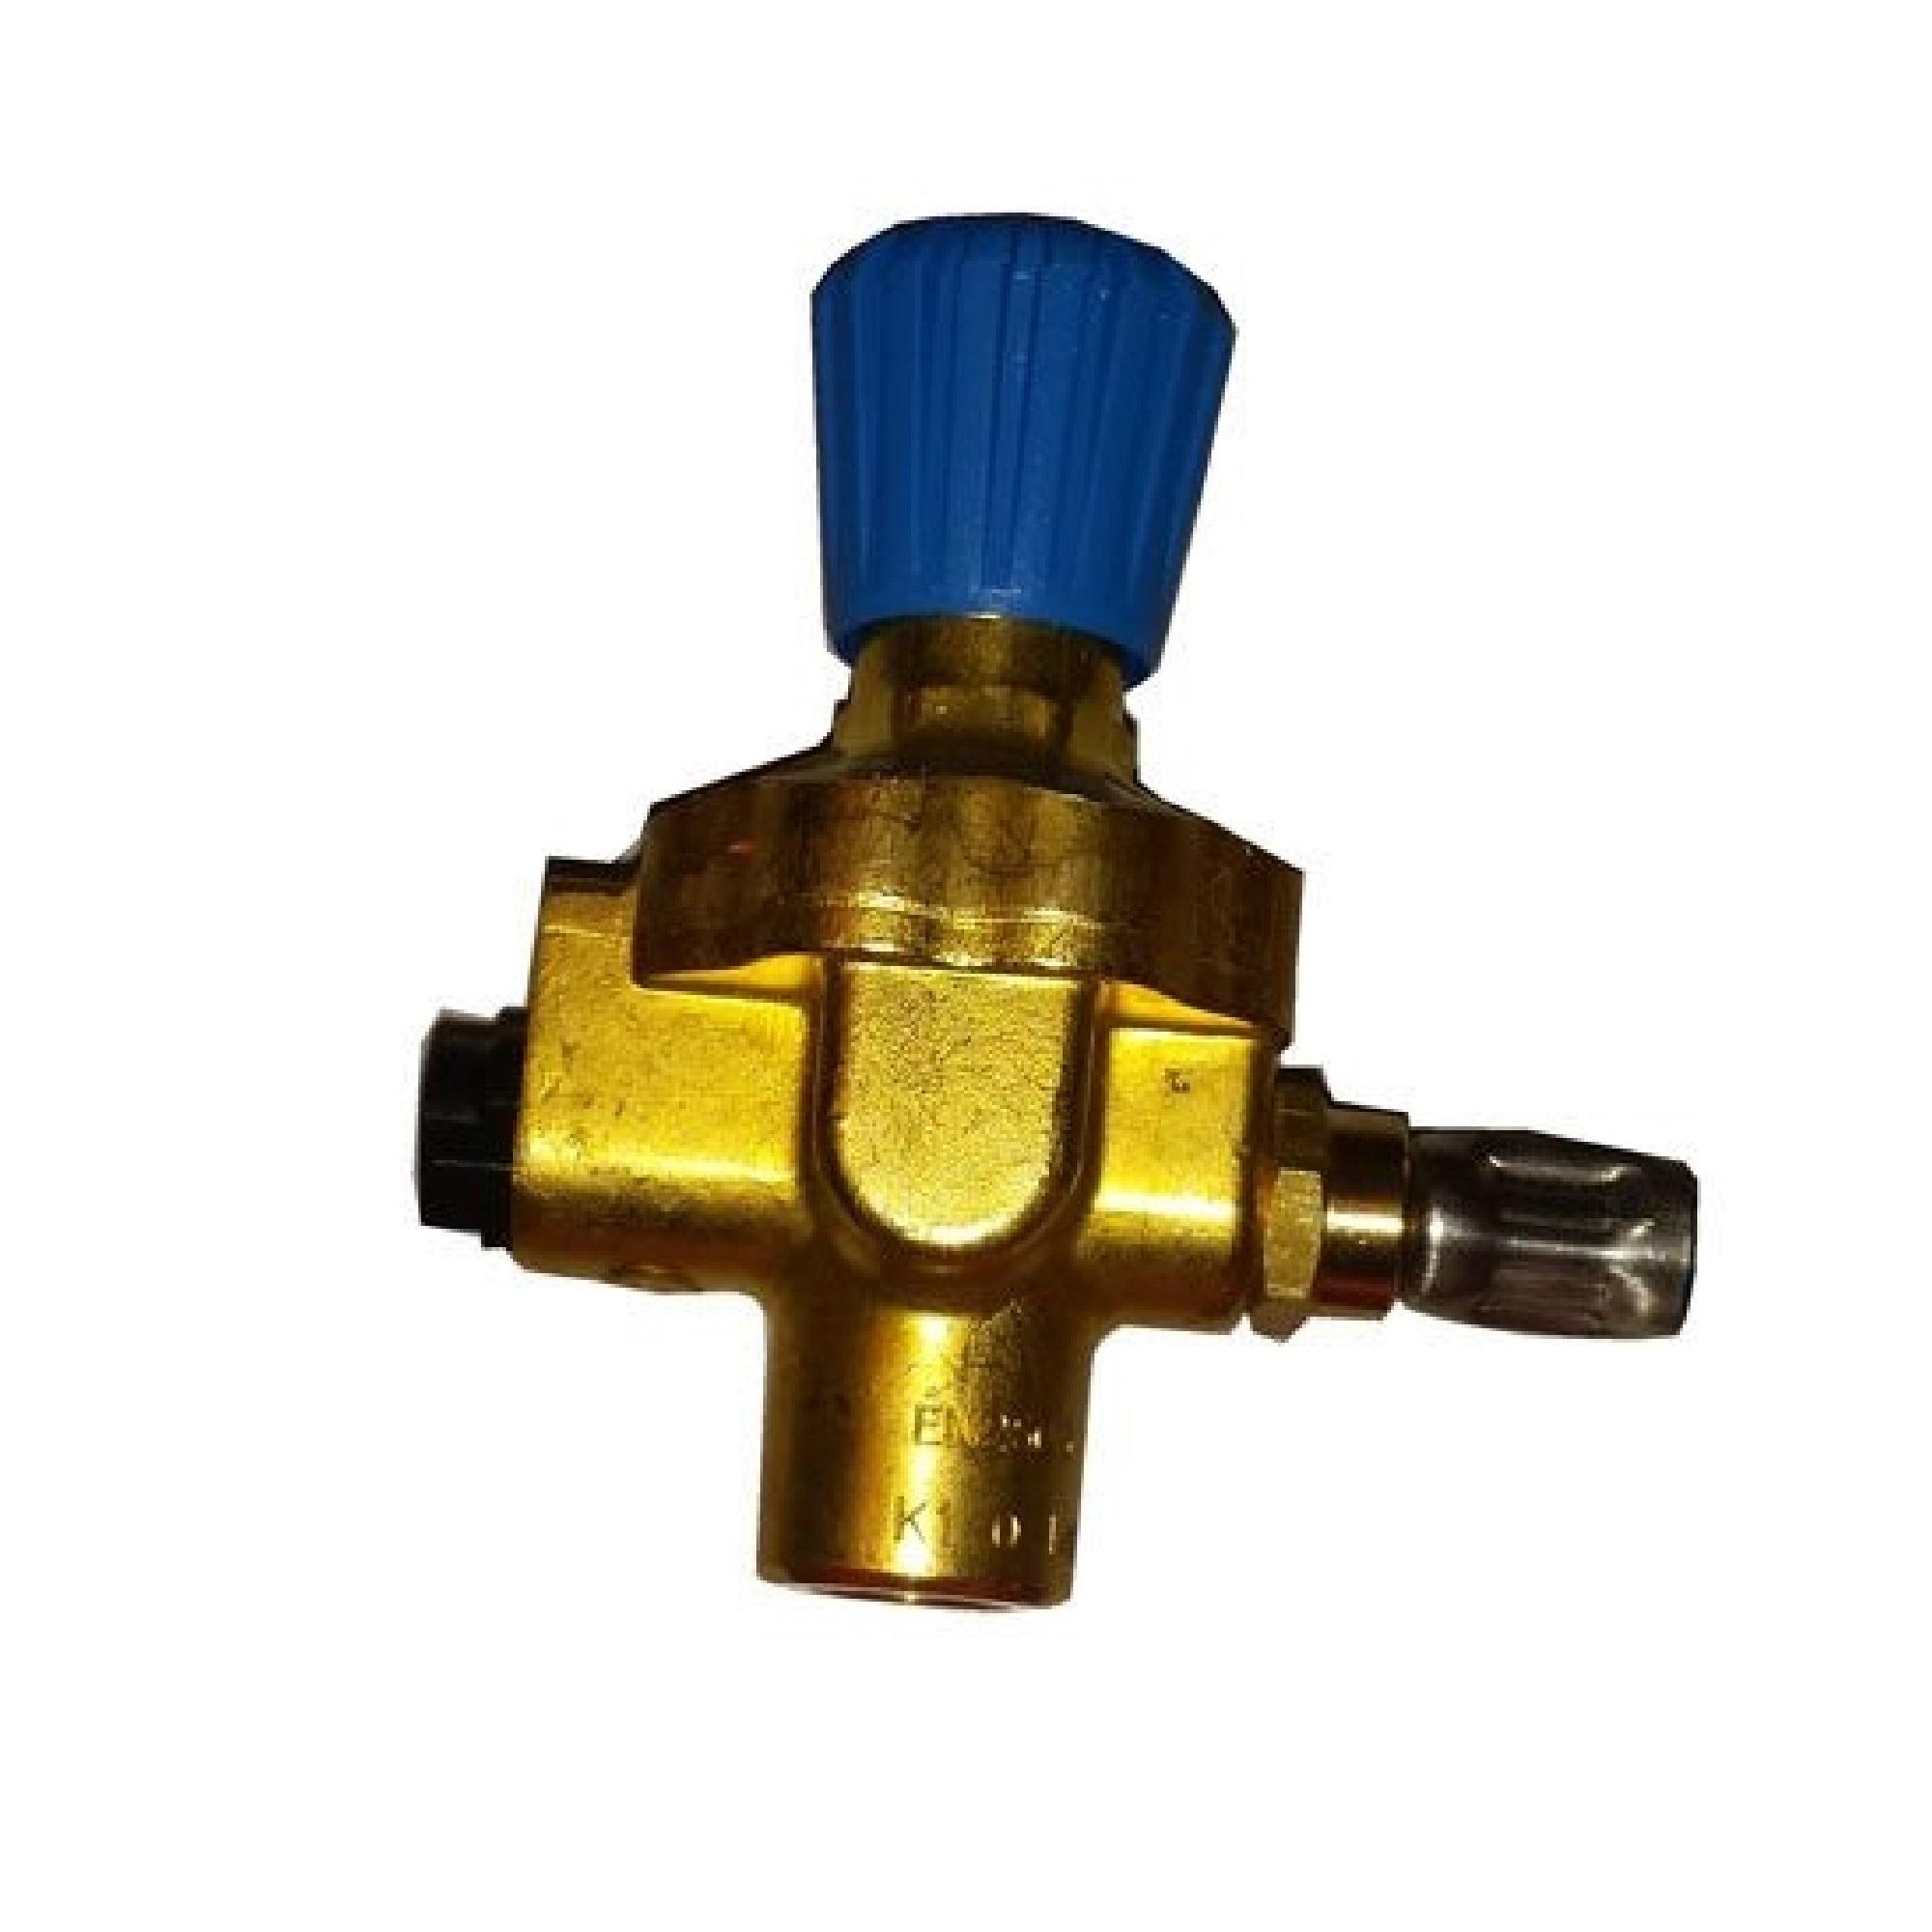 Metal Oxyturno oxygen regulator with blue knob